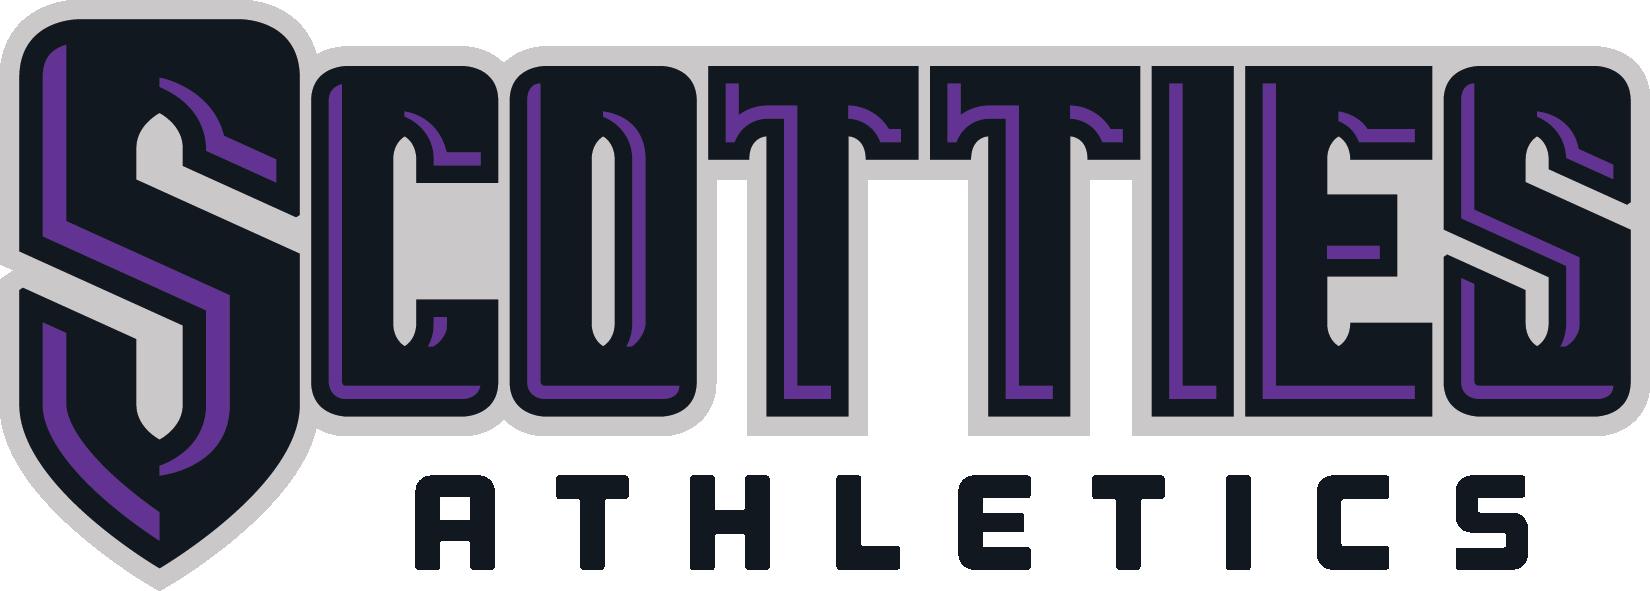 ss_scotties_athletics_C.png